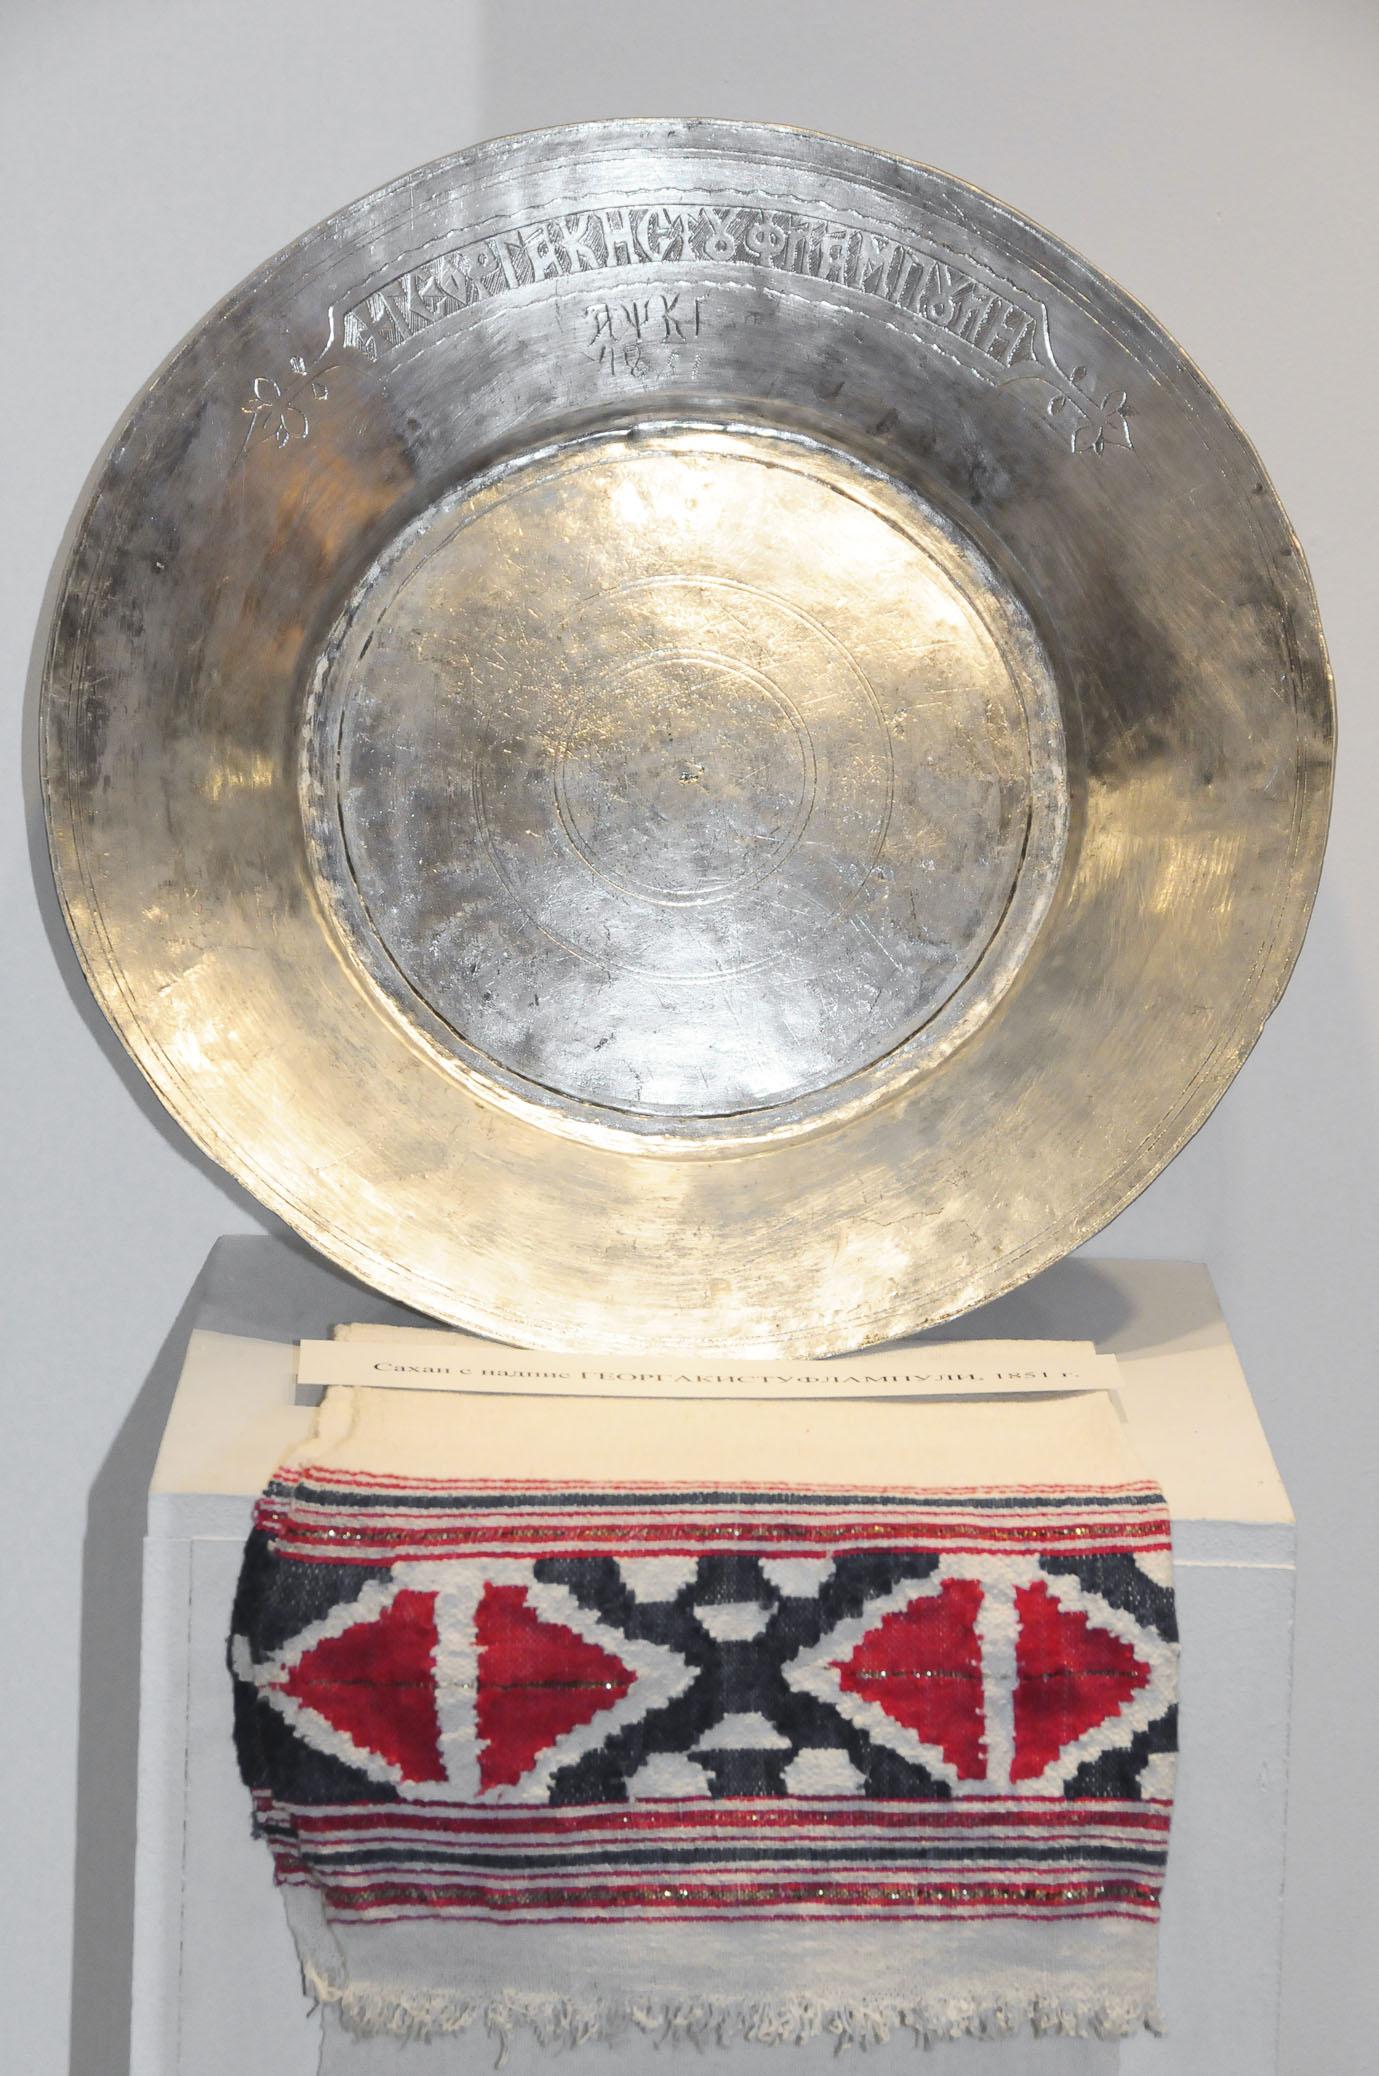 troyan-museum-mednikarstvo-ot-troyanskiq-krai-5